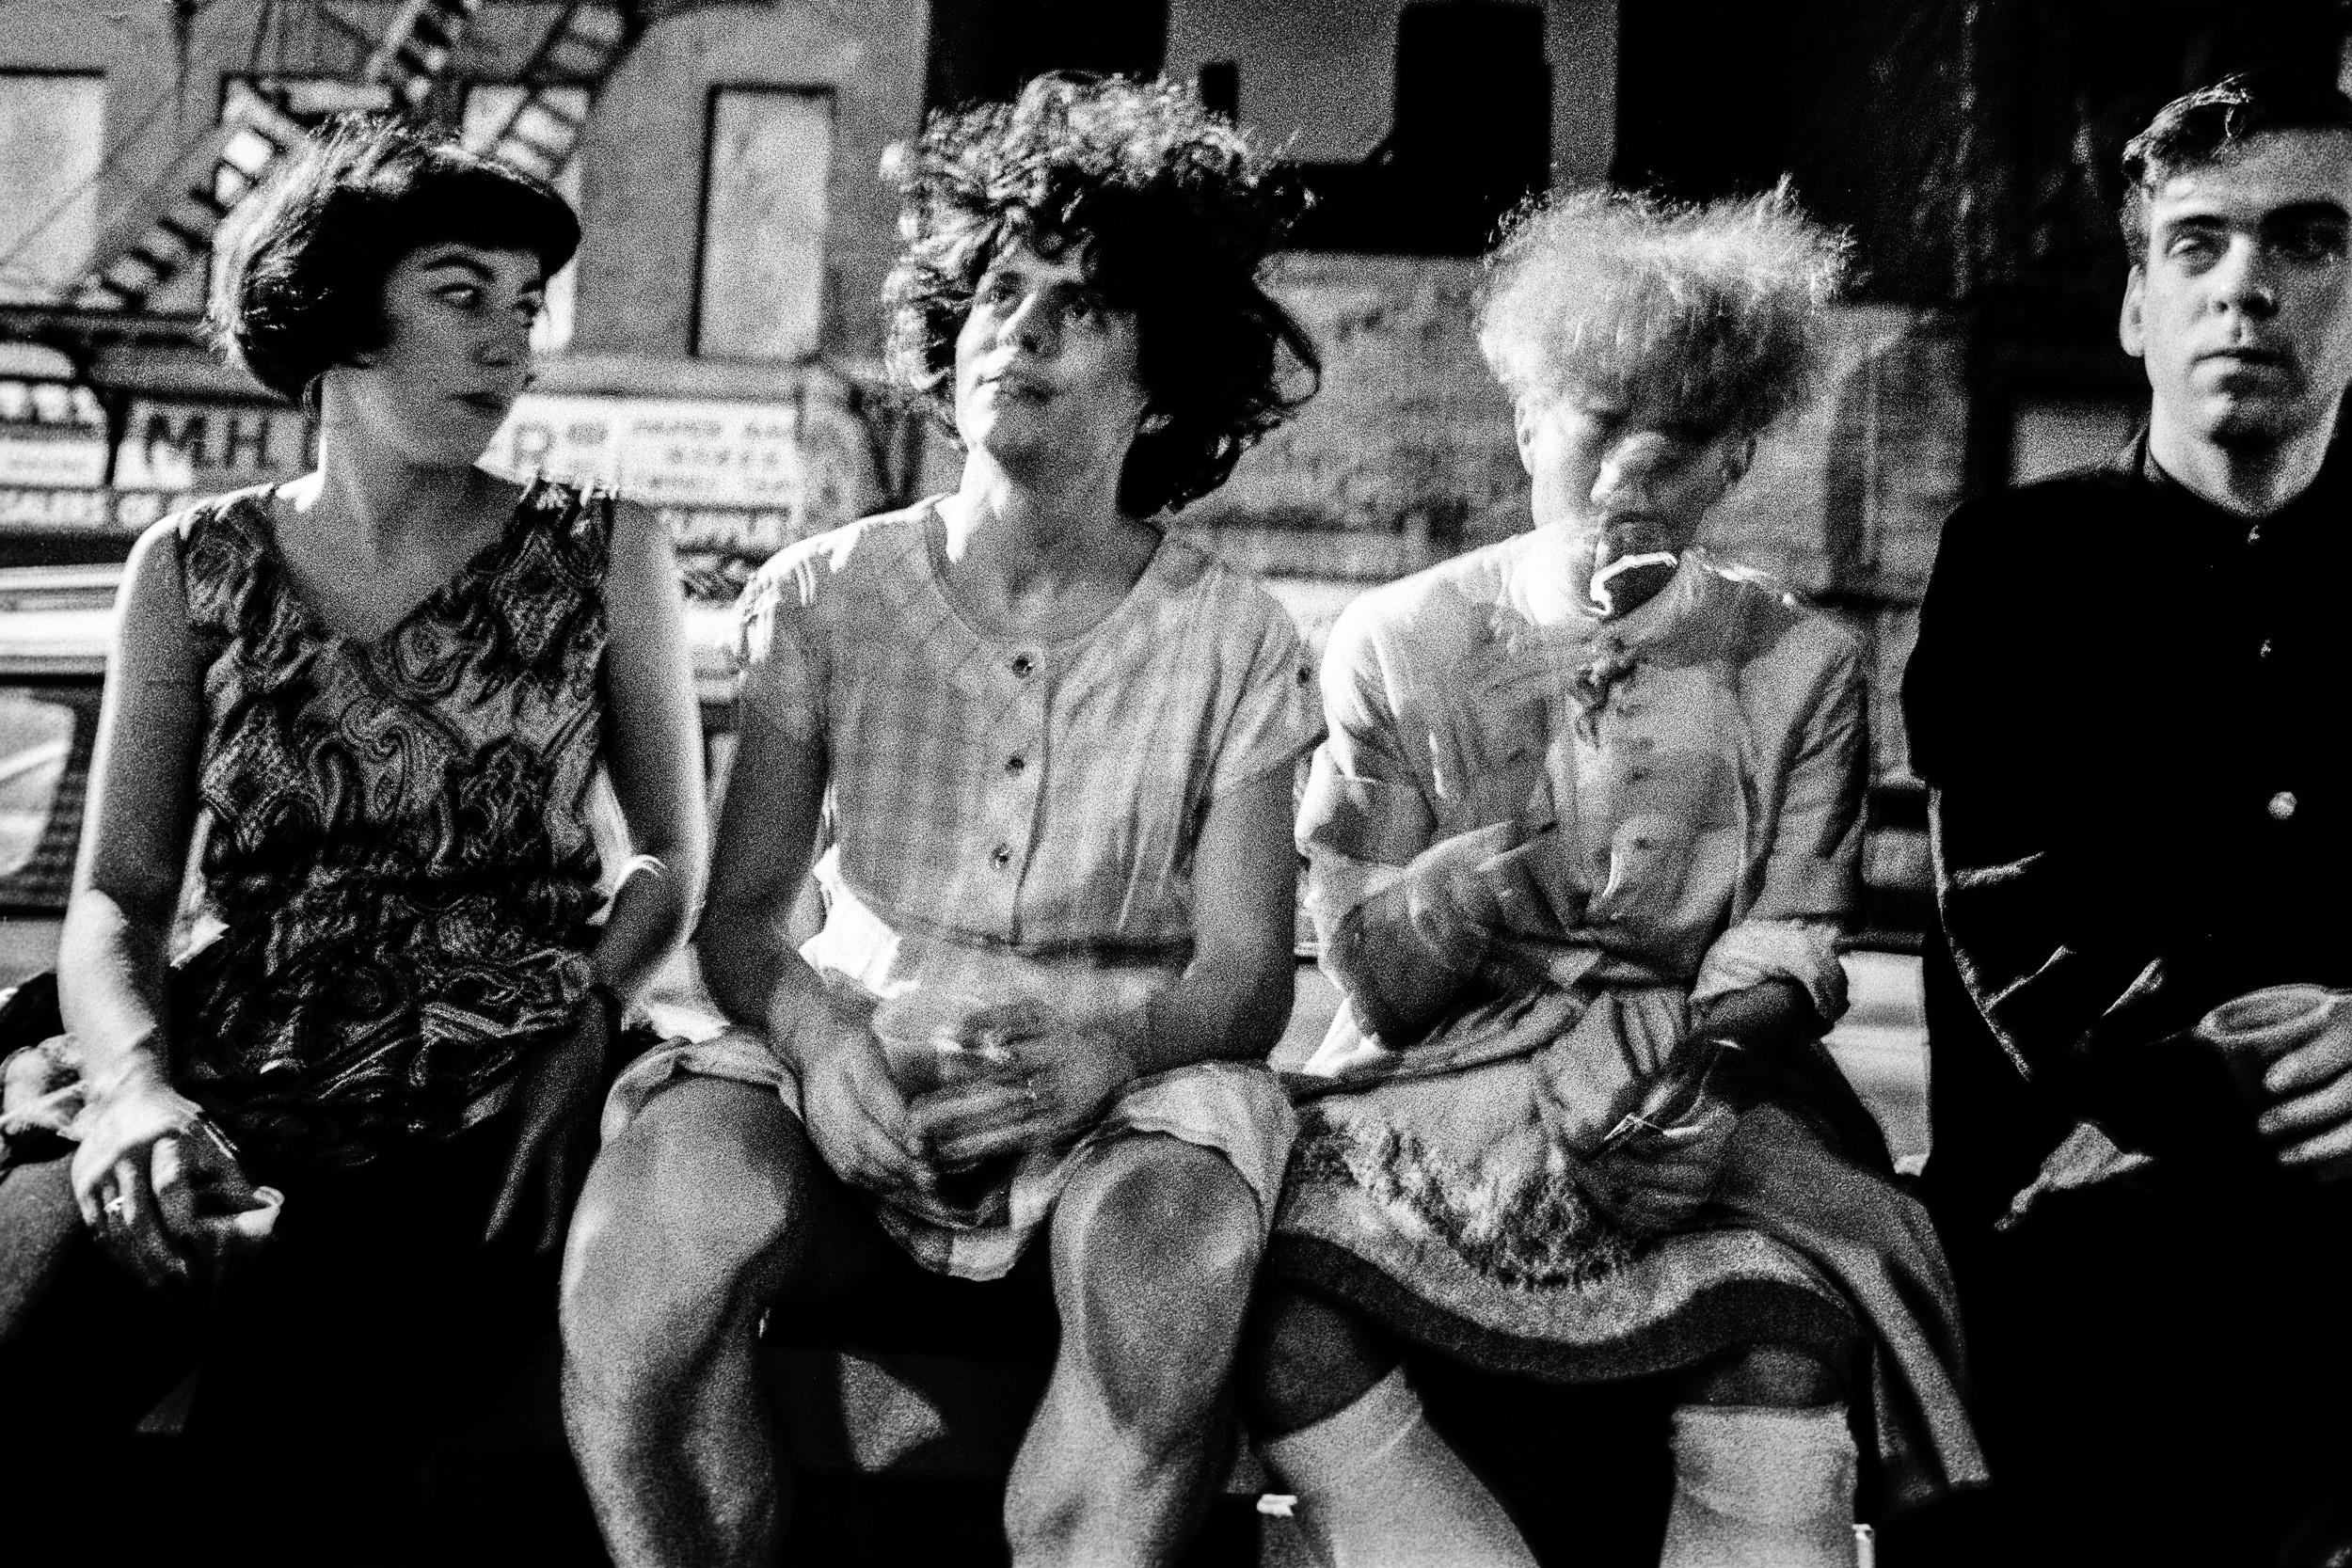 Ken Schles - Outside In Drag, Sitting On Garbage Cans, 1986.jpg